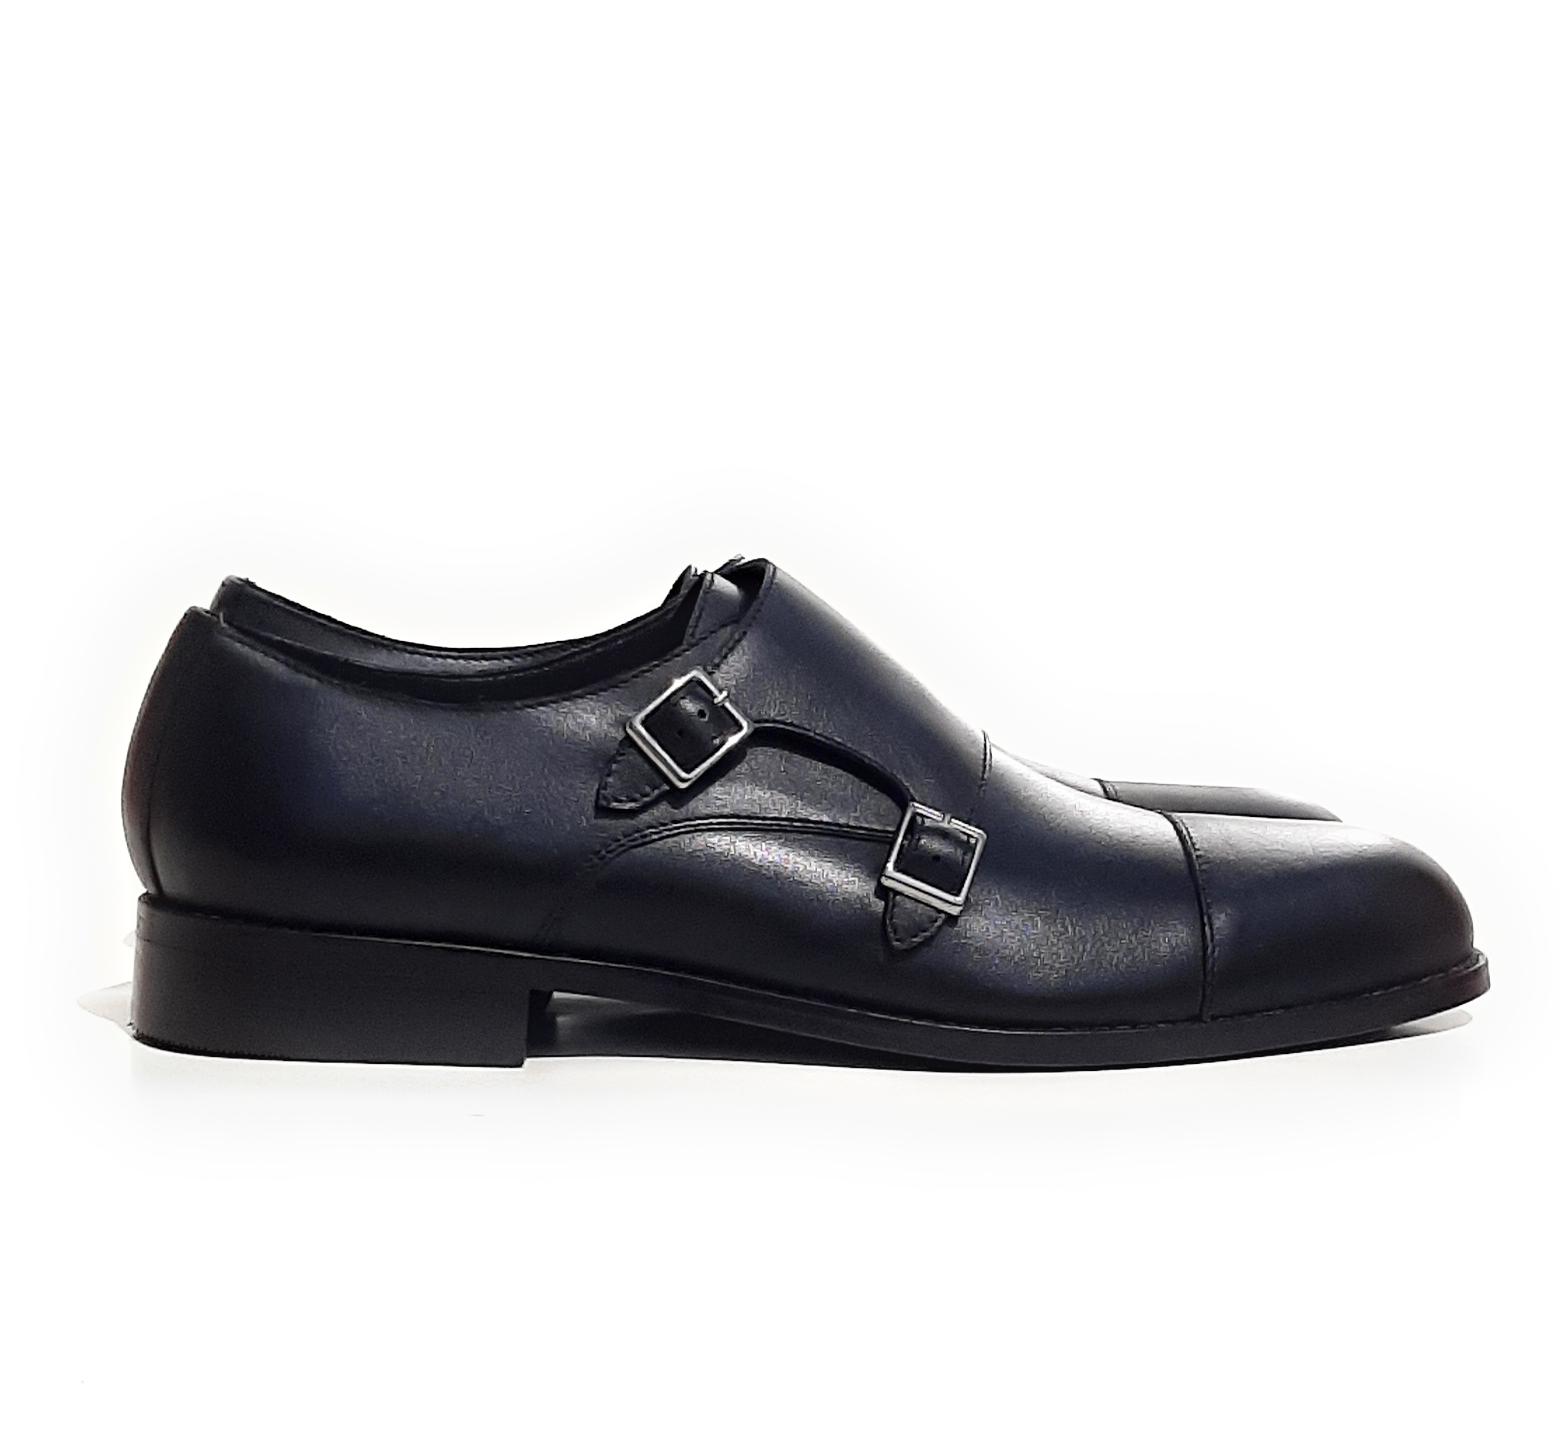 Strap Monk Shoes